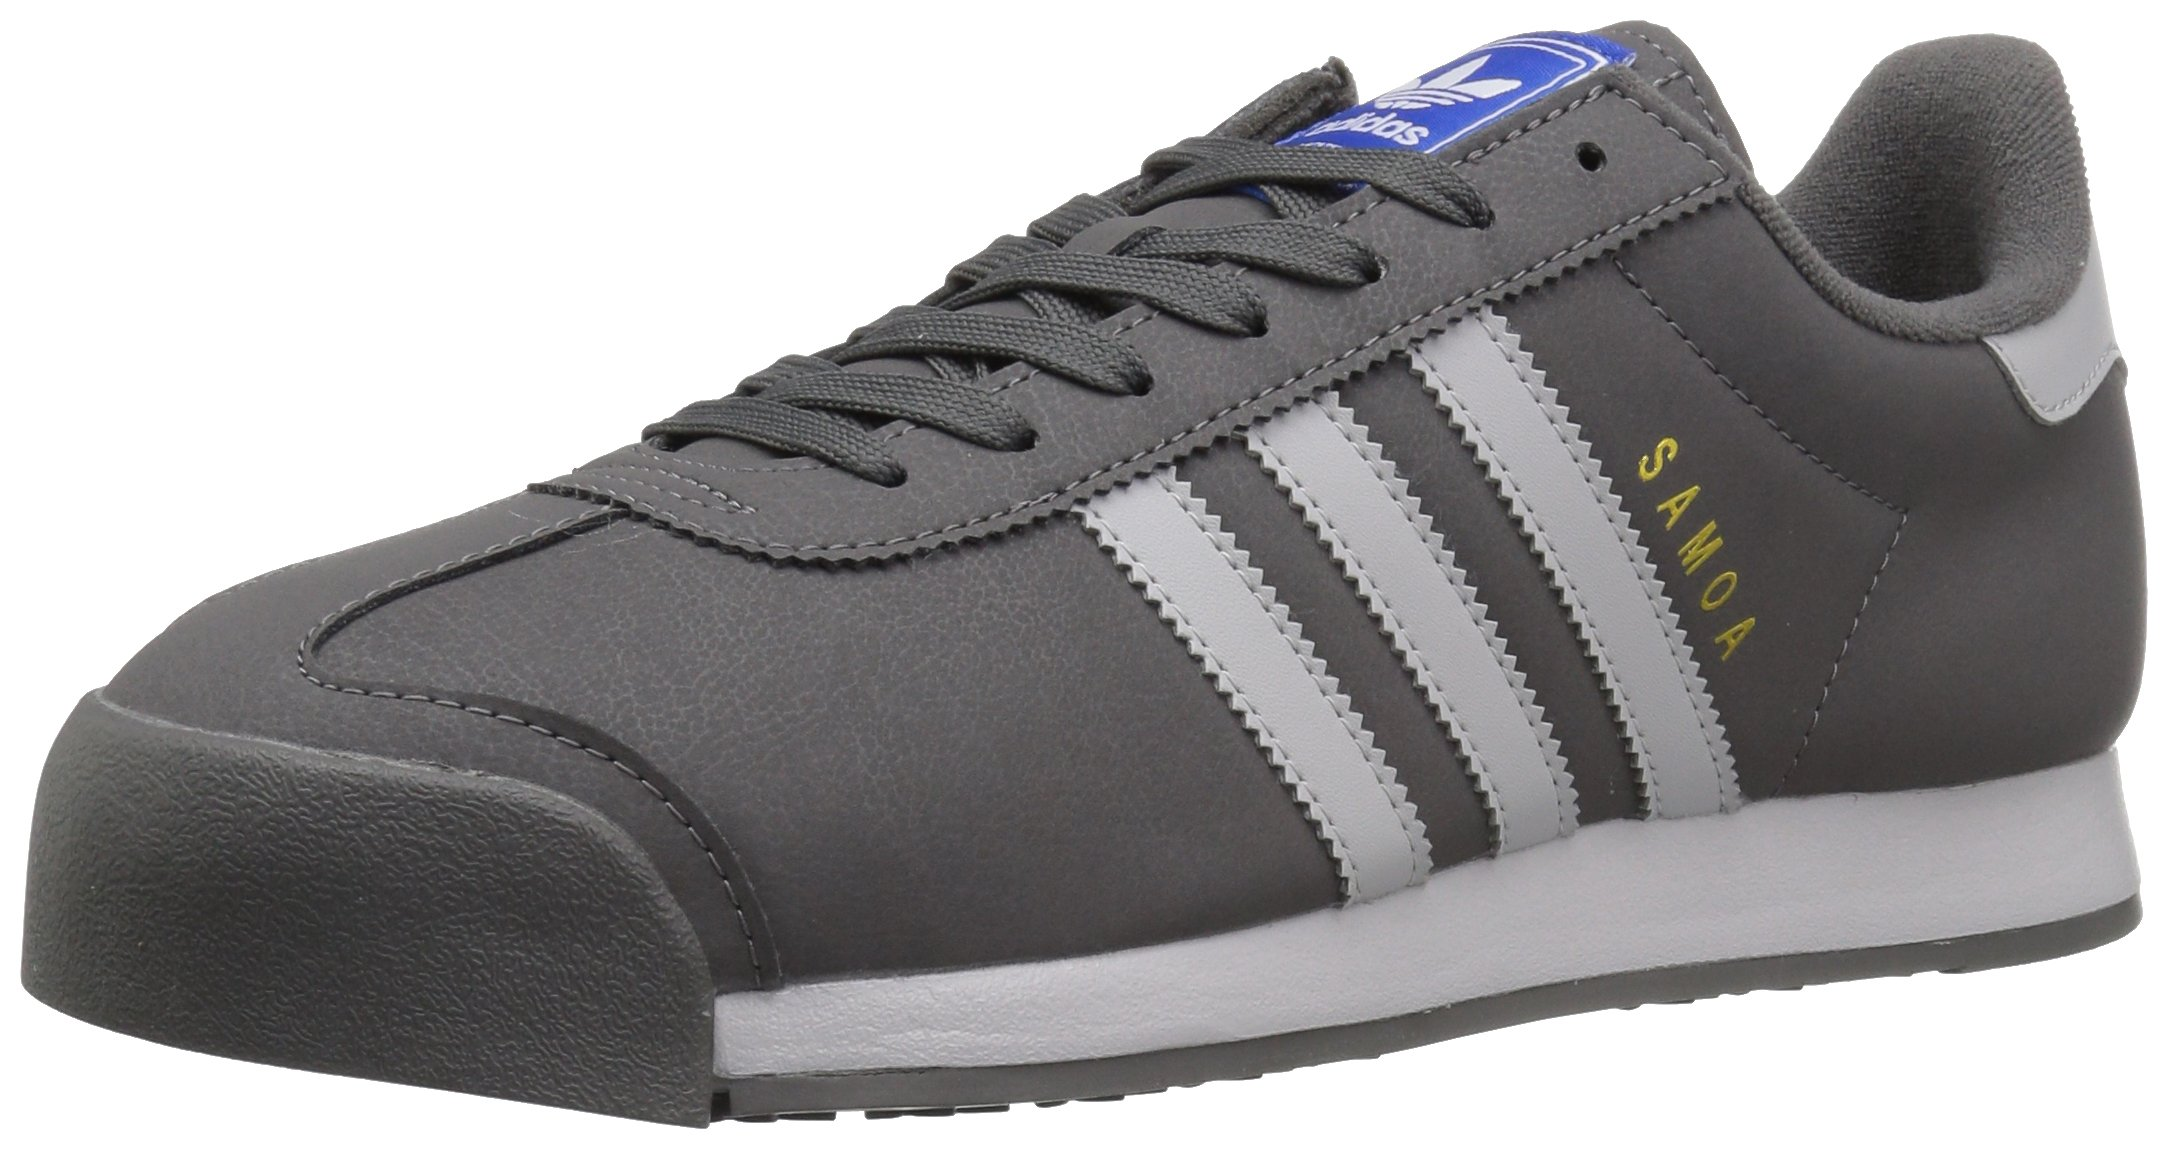 bf64e1c88a5e4 adidas Originals Men's Samoa Retro Sneaker Running Shoe, Granite/LGH Solid  Grey/Satellite, ((10 M US)